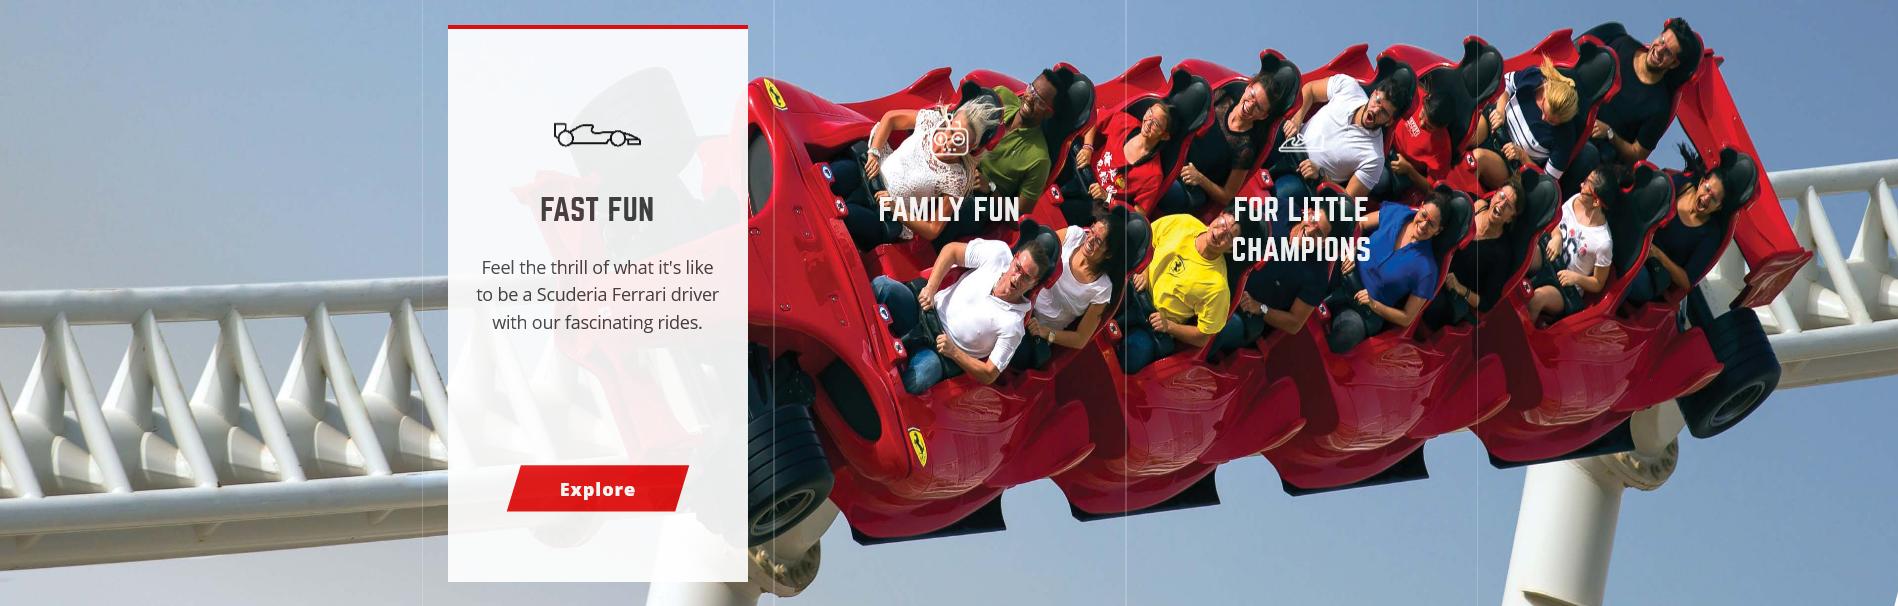 Ferrari world coupon code